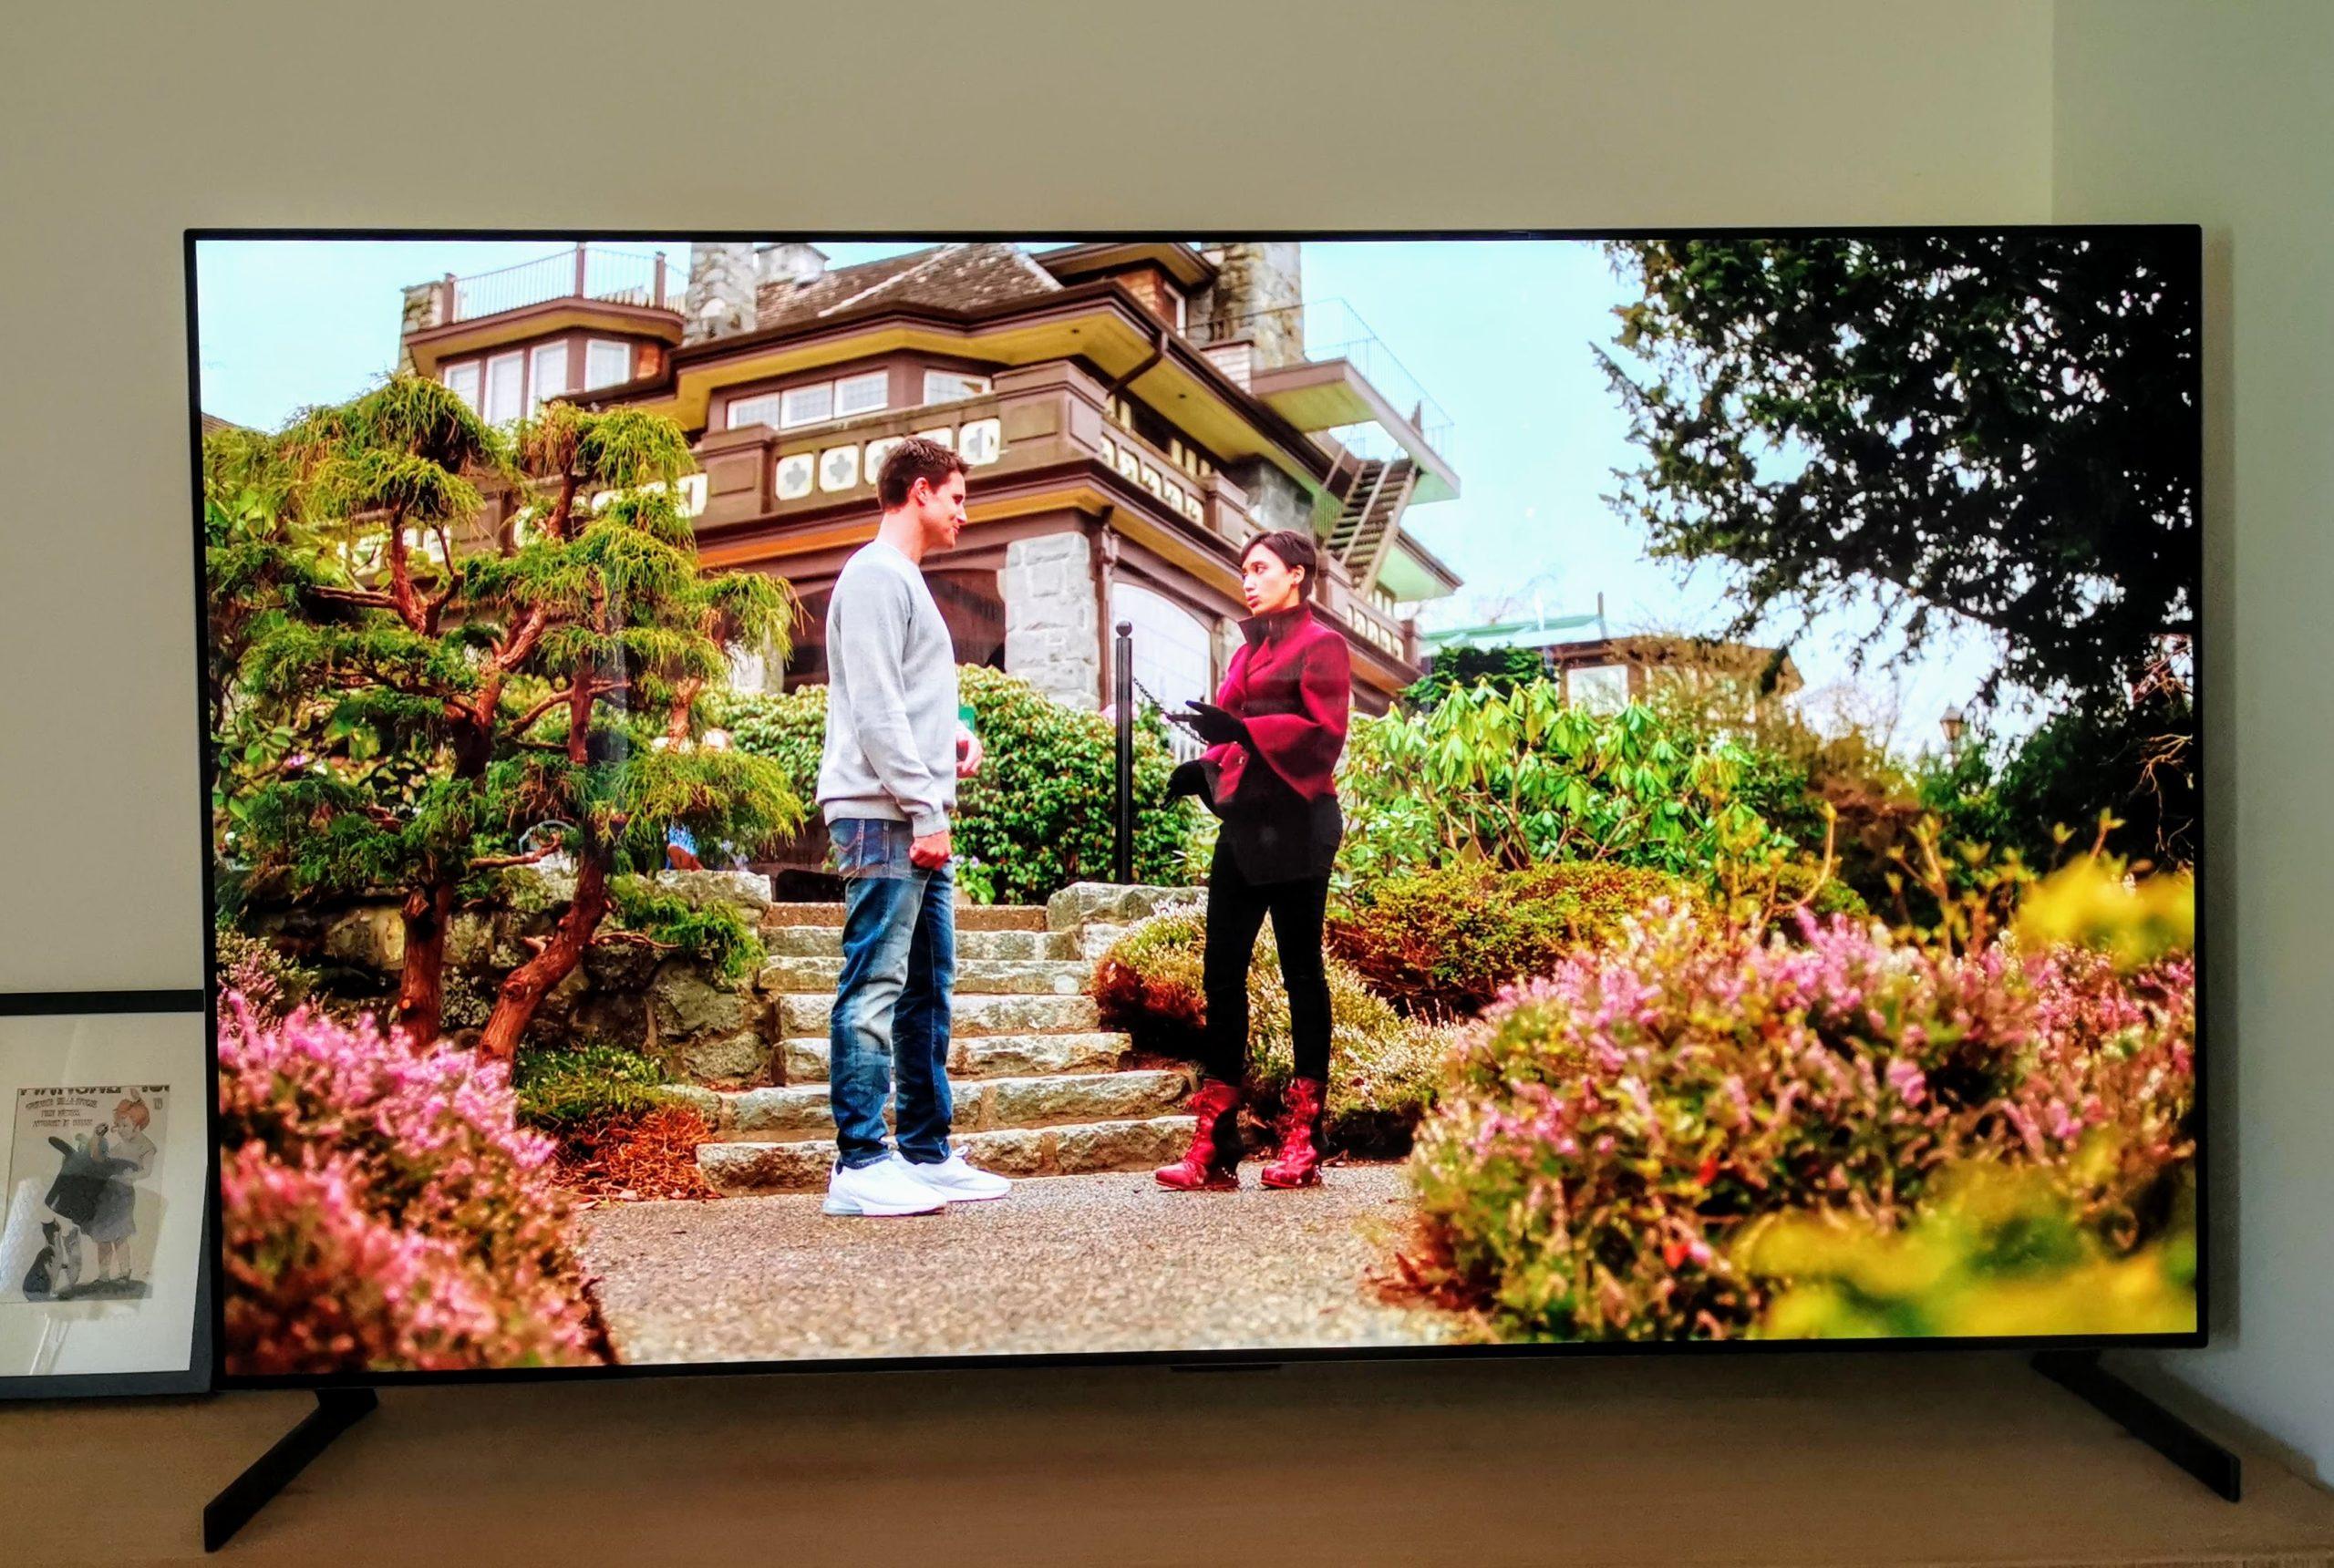 Review LG OLED65GX oled tv